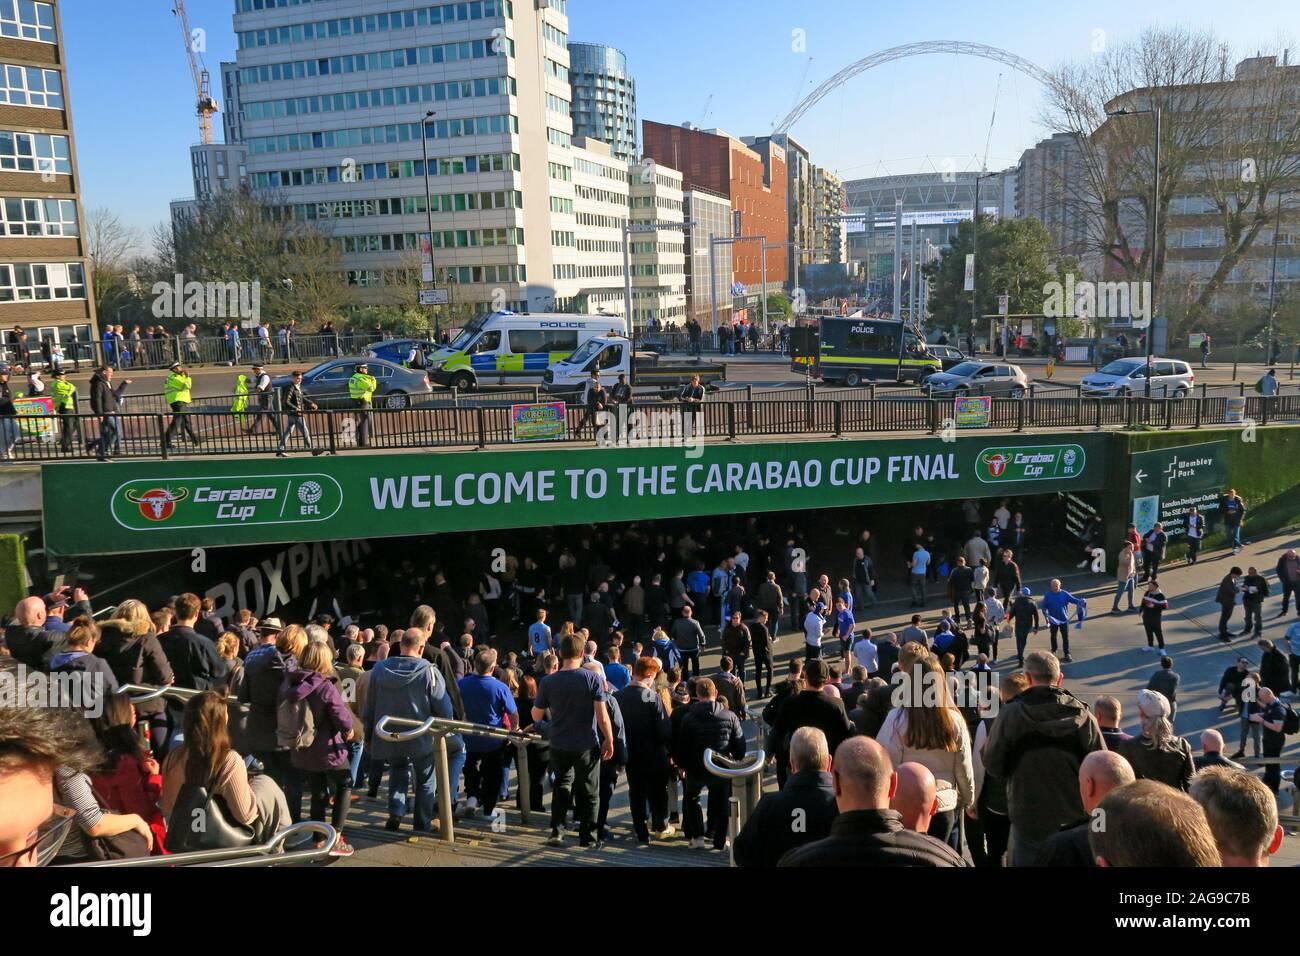 HotpixUk,@hotpixUK,GoTonySmith,Wembley,North London,England,UK,Wembley Stadium,HA9,Mancs,Mancunians,Manchester City Fans,MCFC fans,English Football League,2019,cup final,Manchester City,Chelsea,final,Manc,loyal fans,soccer,Carabao,match,London,fans,stadium,season ticket owners,crowds,flags,crowd,flag,cup,EFL,blue flags,EFL Cup,pitch